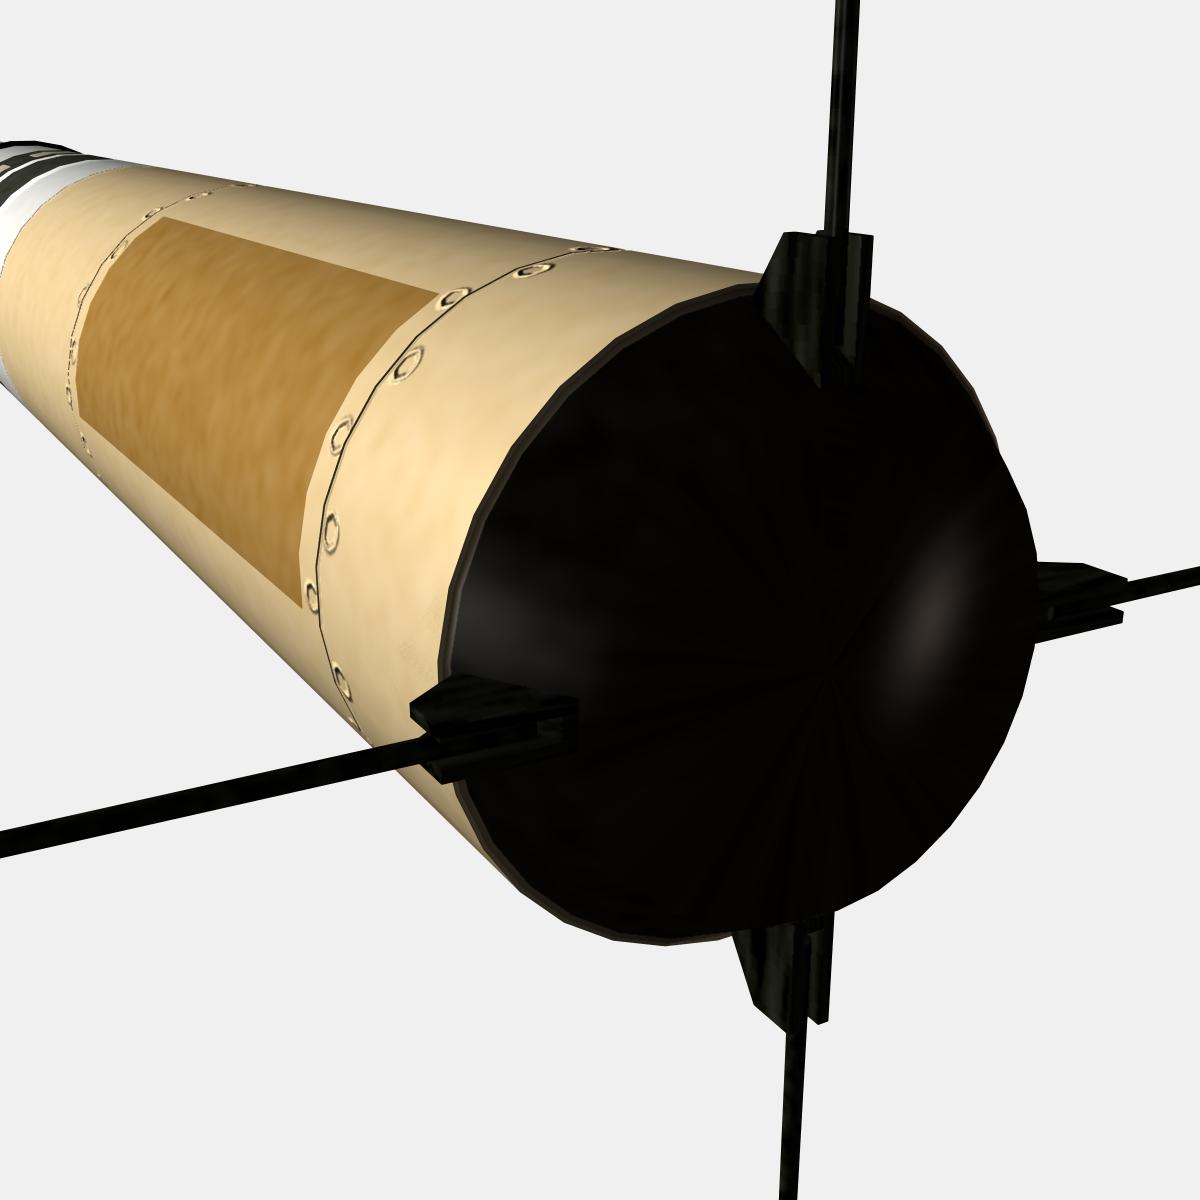 mk-234 nulka decoy 3d model 3ds dxf fbx blend cob dae x obj 217812